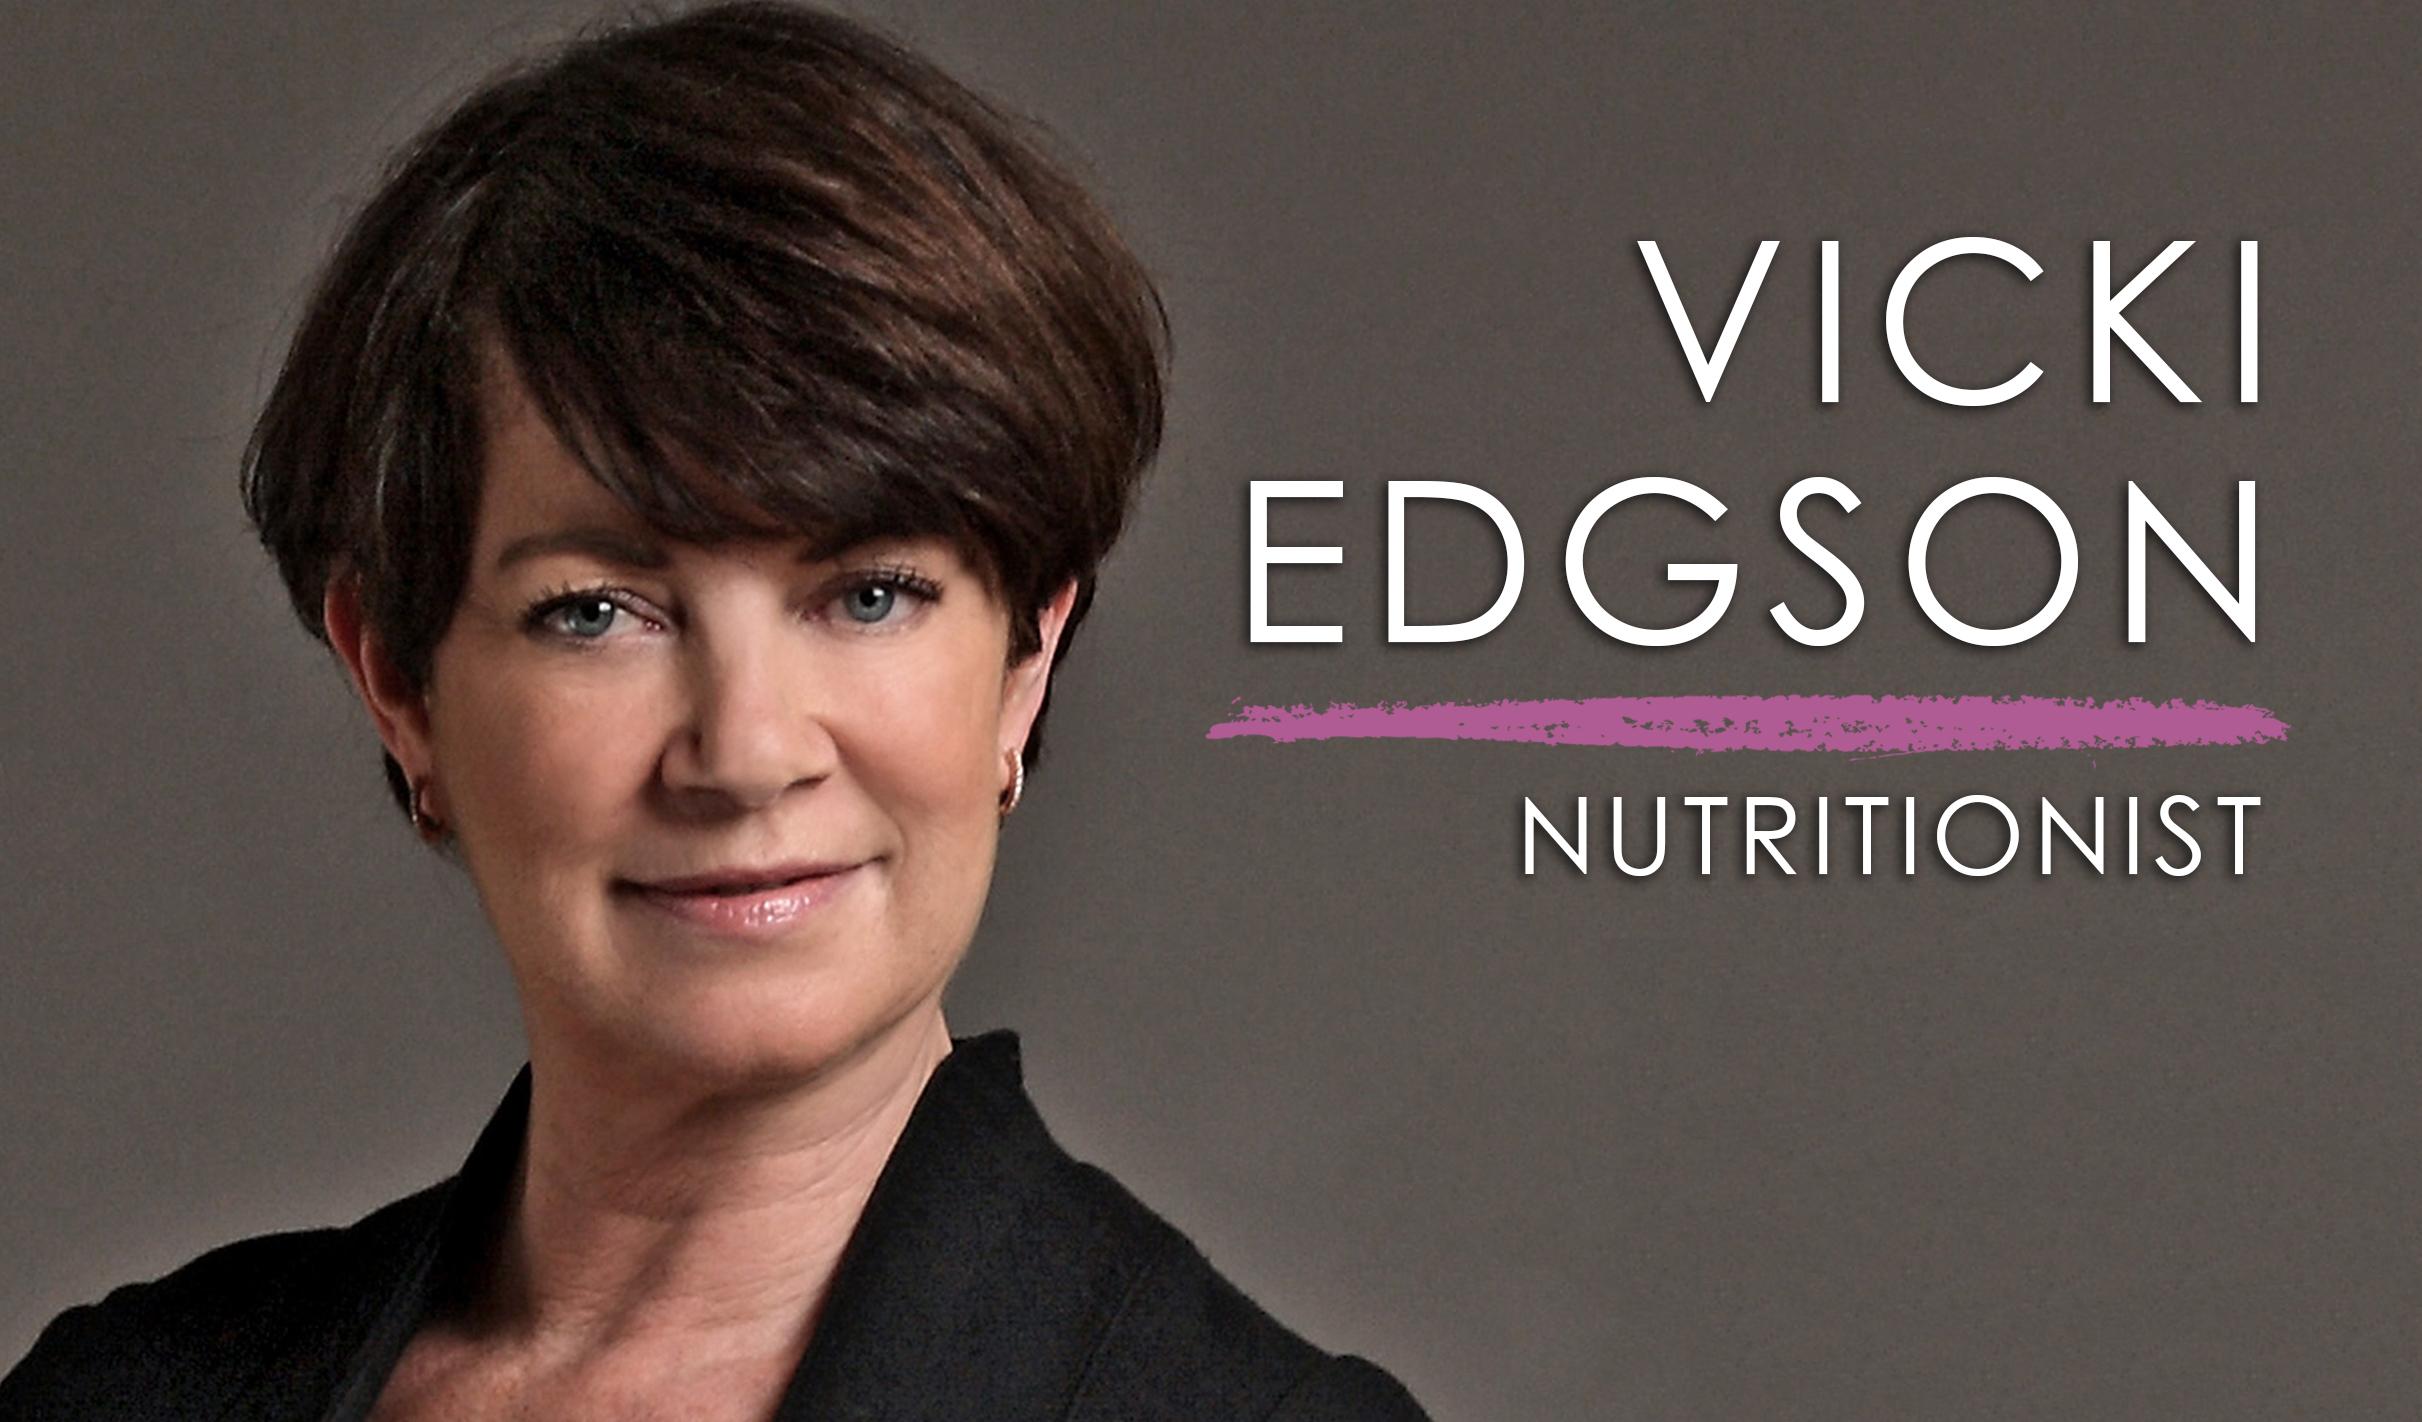 VICKI EDGSON ARTICLE